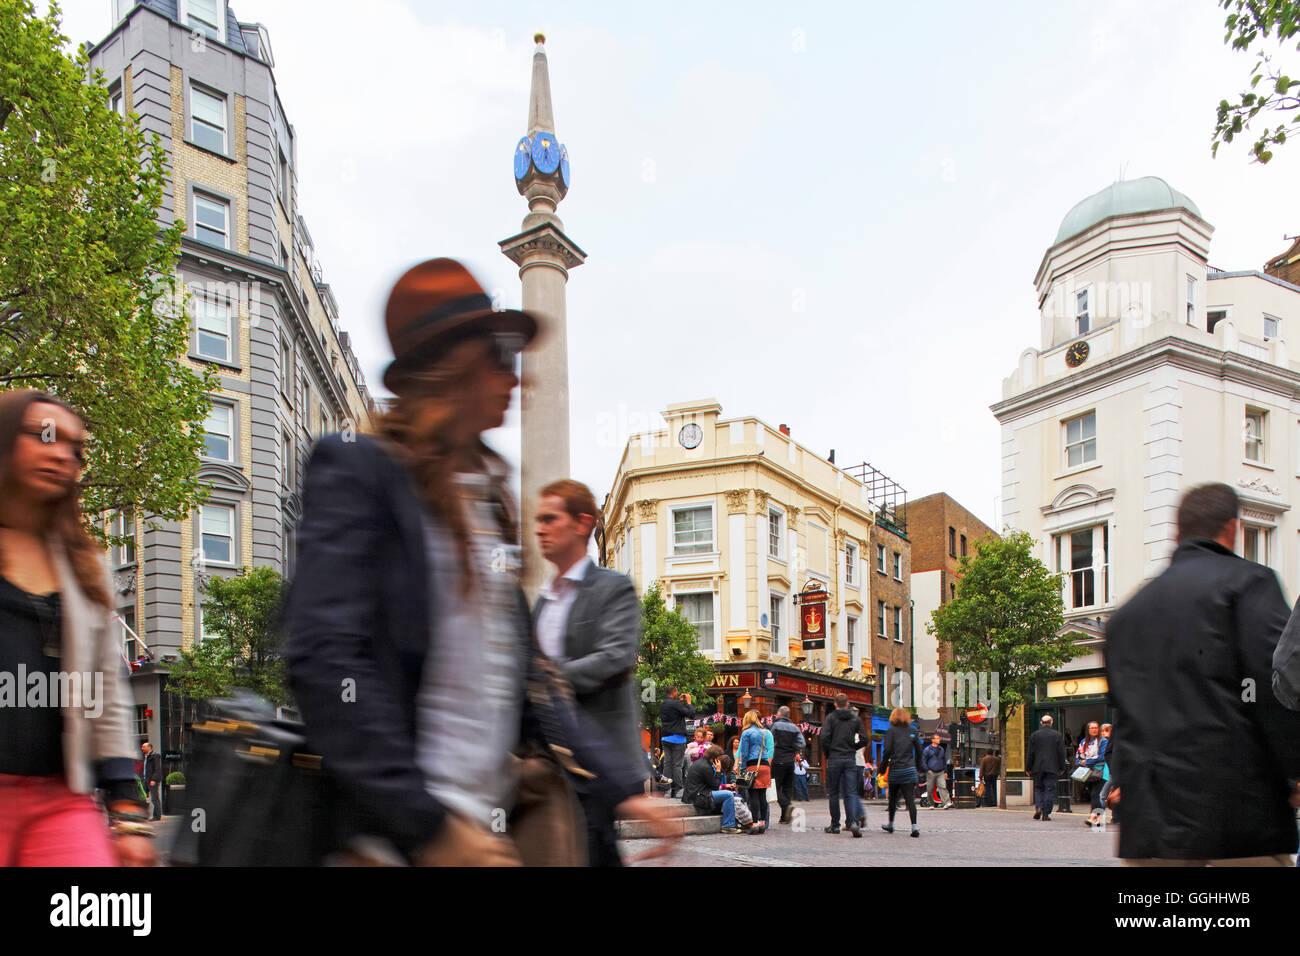 Seven Dials, West End, London, England, United Kingdom - Stock Image